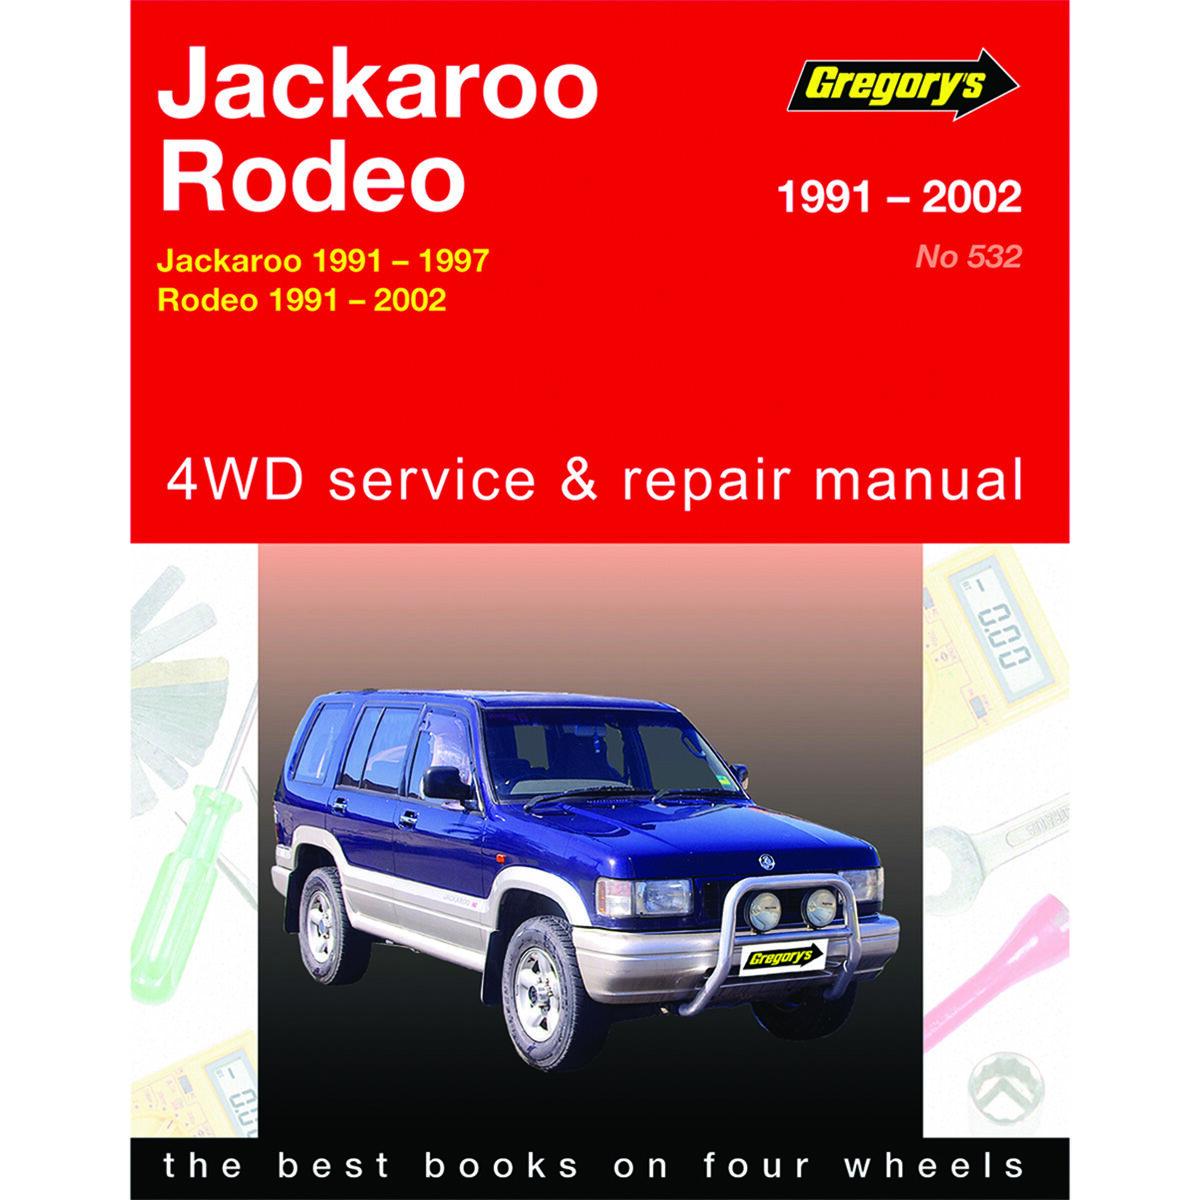 gregory s car manual for holden jackaroo rodeo 1991 2002 532 rh supercheapauto com au